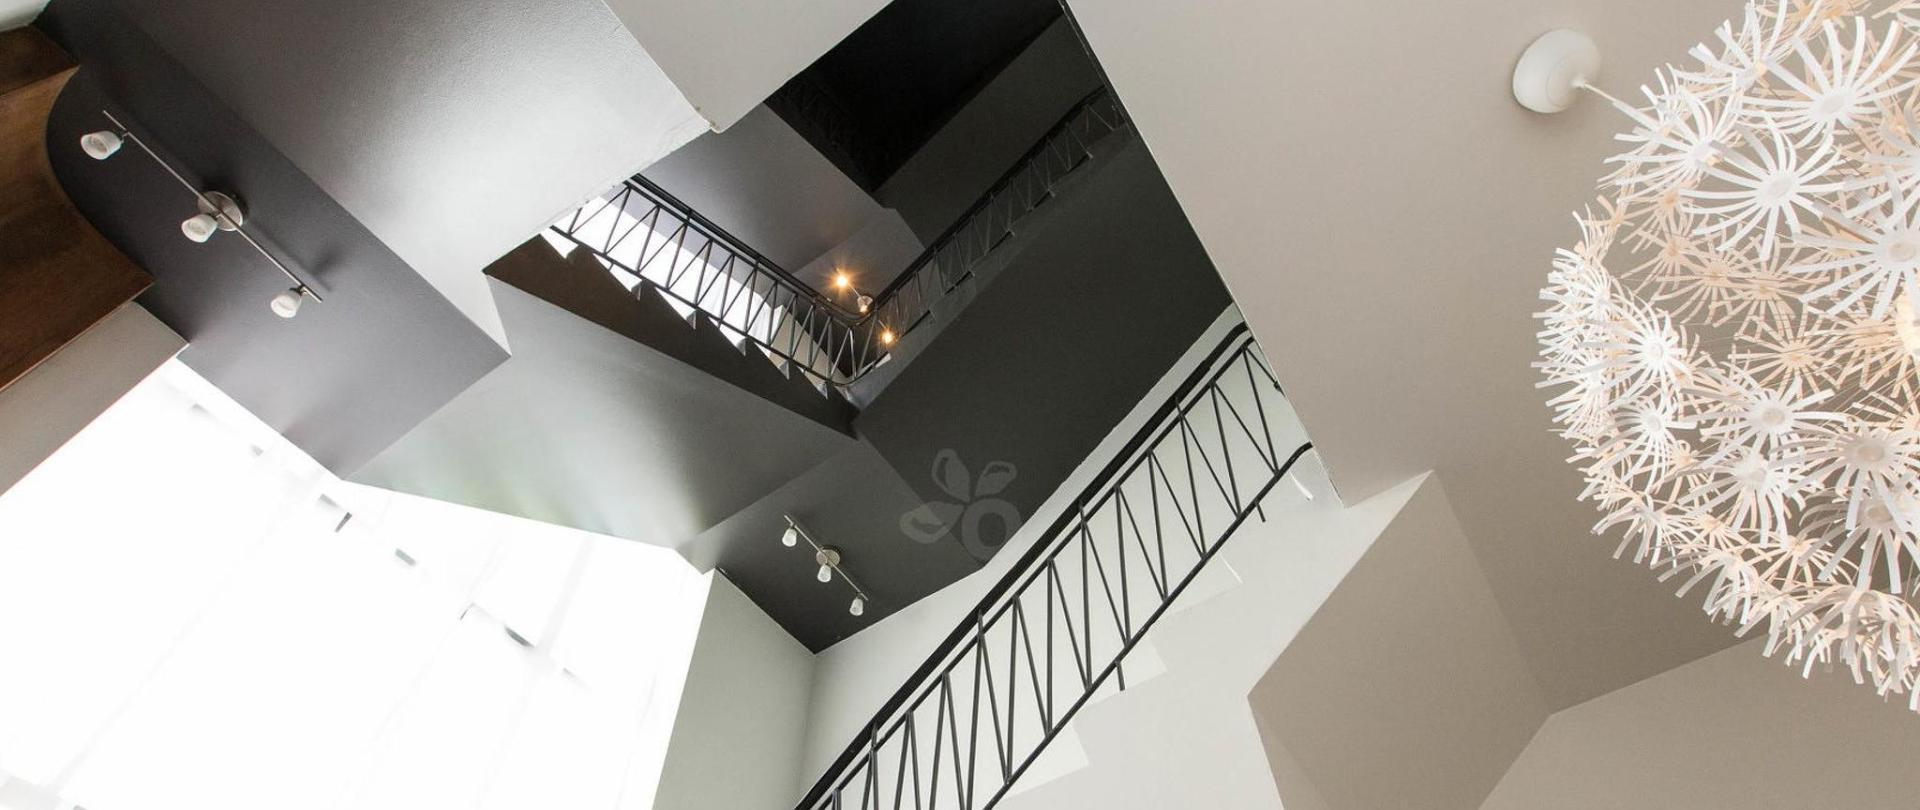 lobby--v17295502-2000.jpg